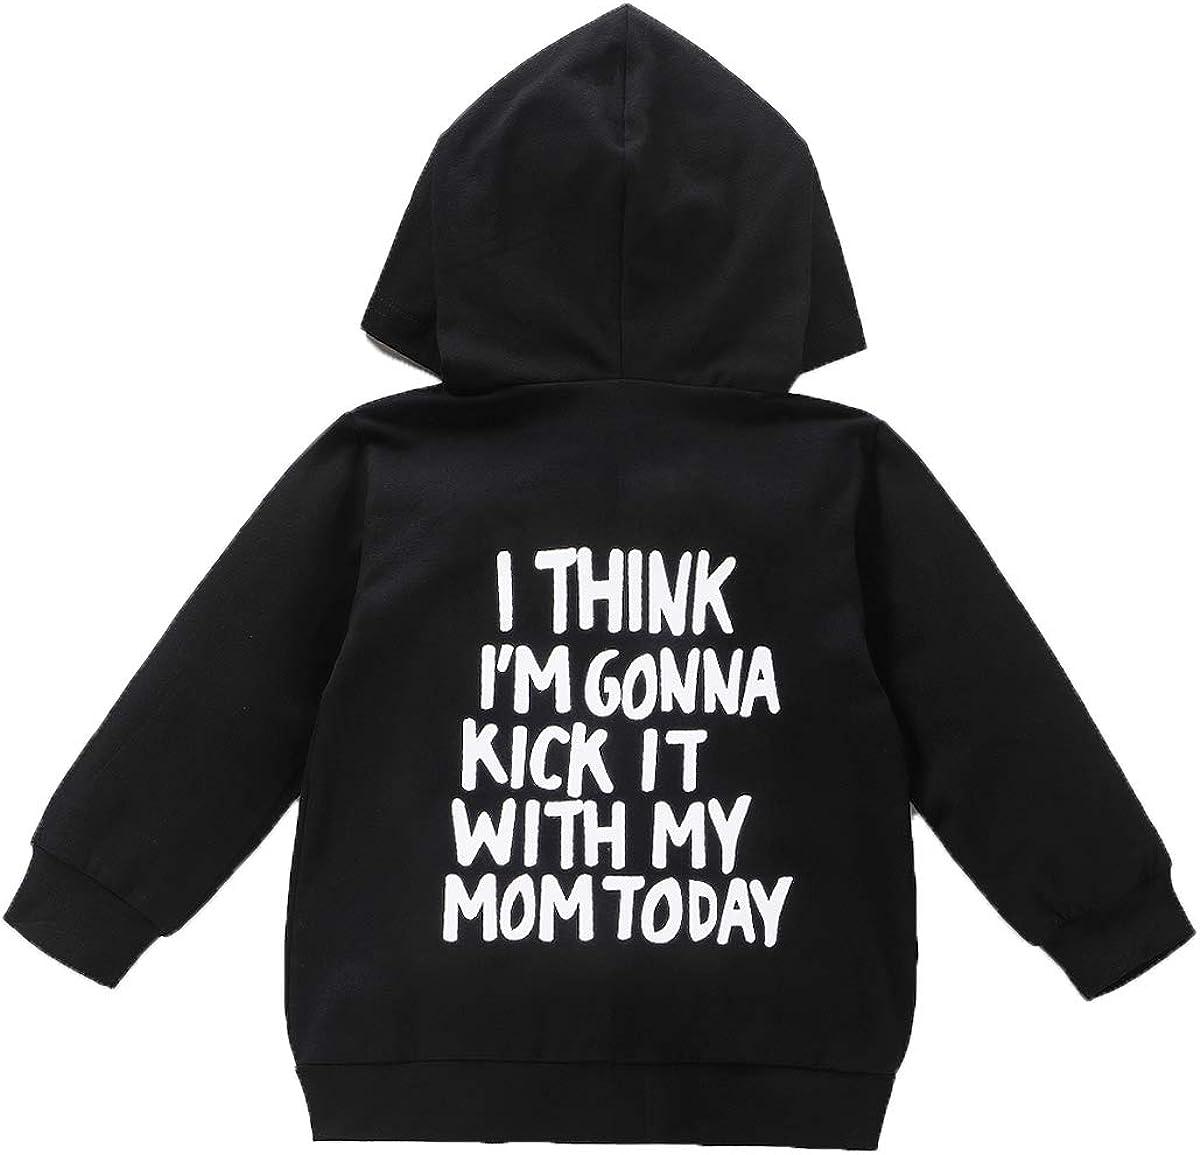 Baby Girls Boys Long Sleeve Zipper Hoodies Sweatshirt Toddler Kids Black Pullover Sweater Tops Winter Fall Outfits (Mom Pullover Hoodies, 2-3T)